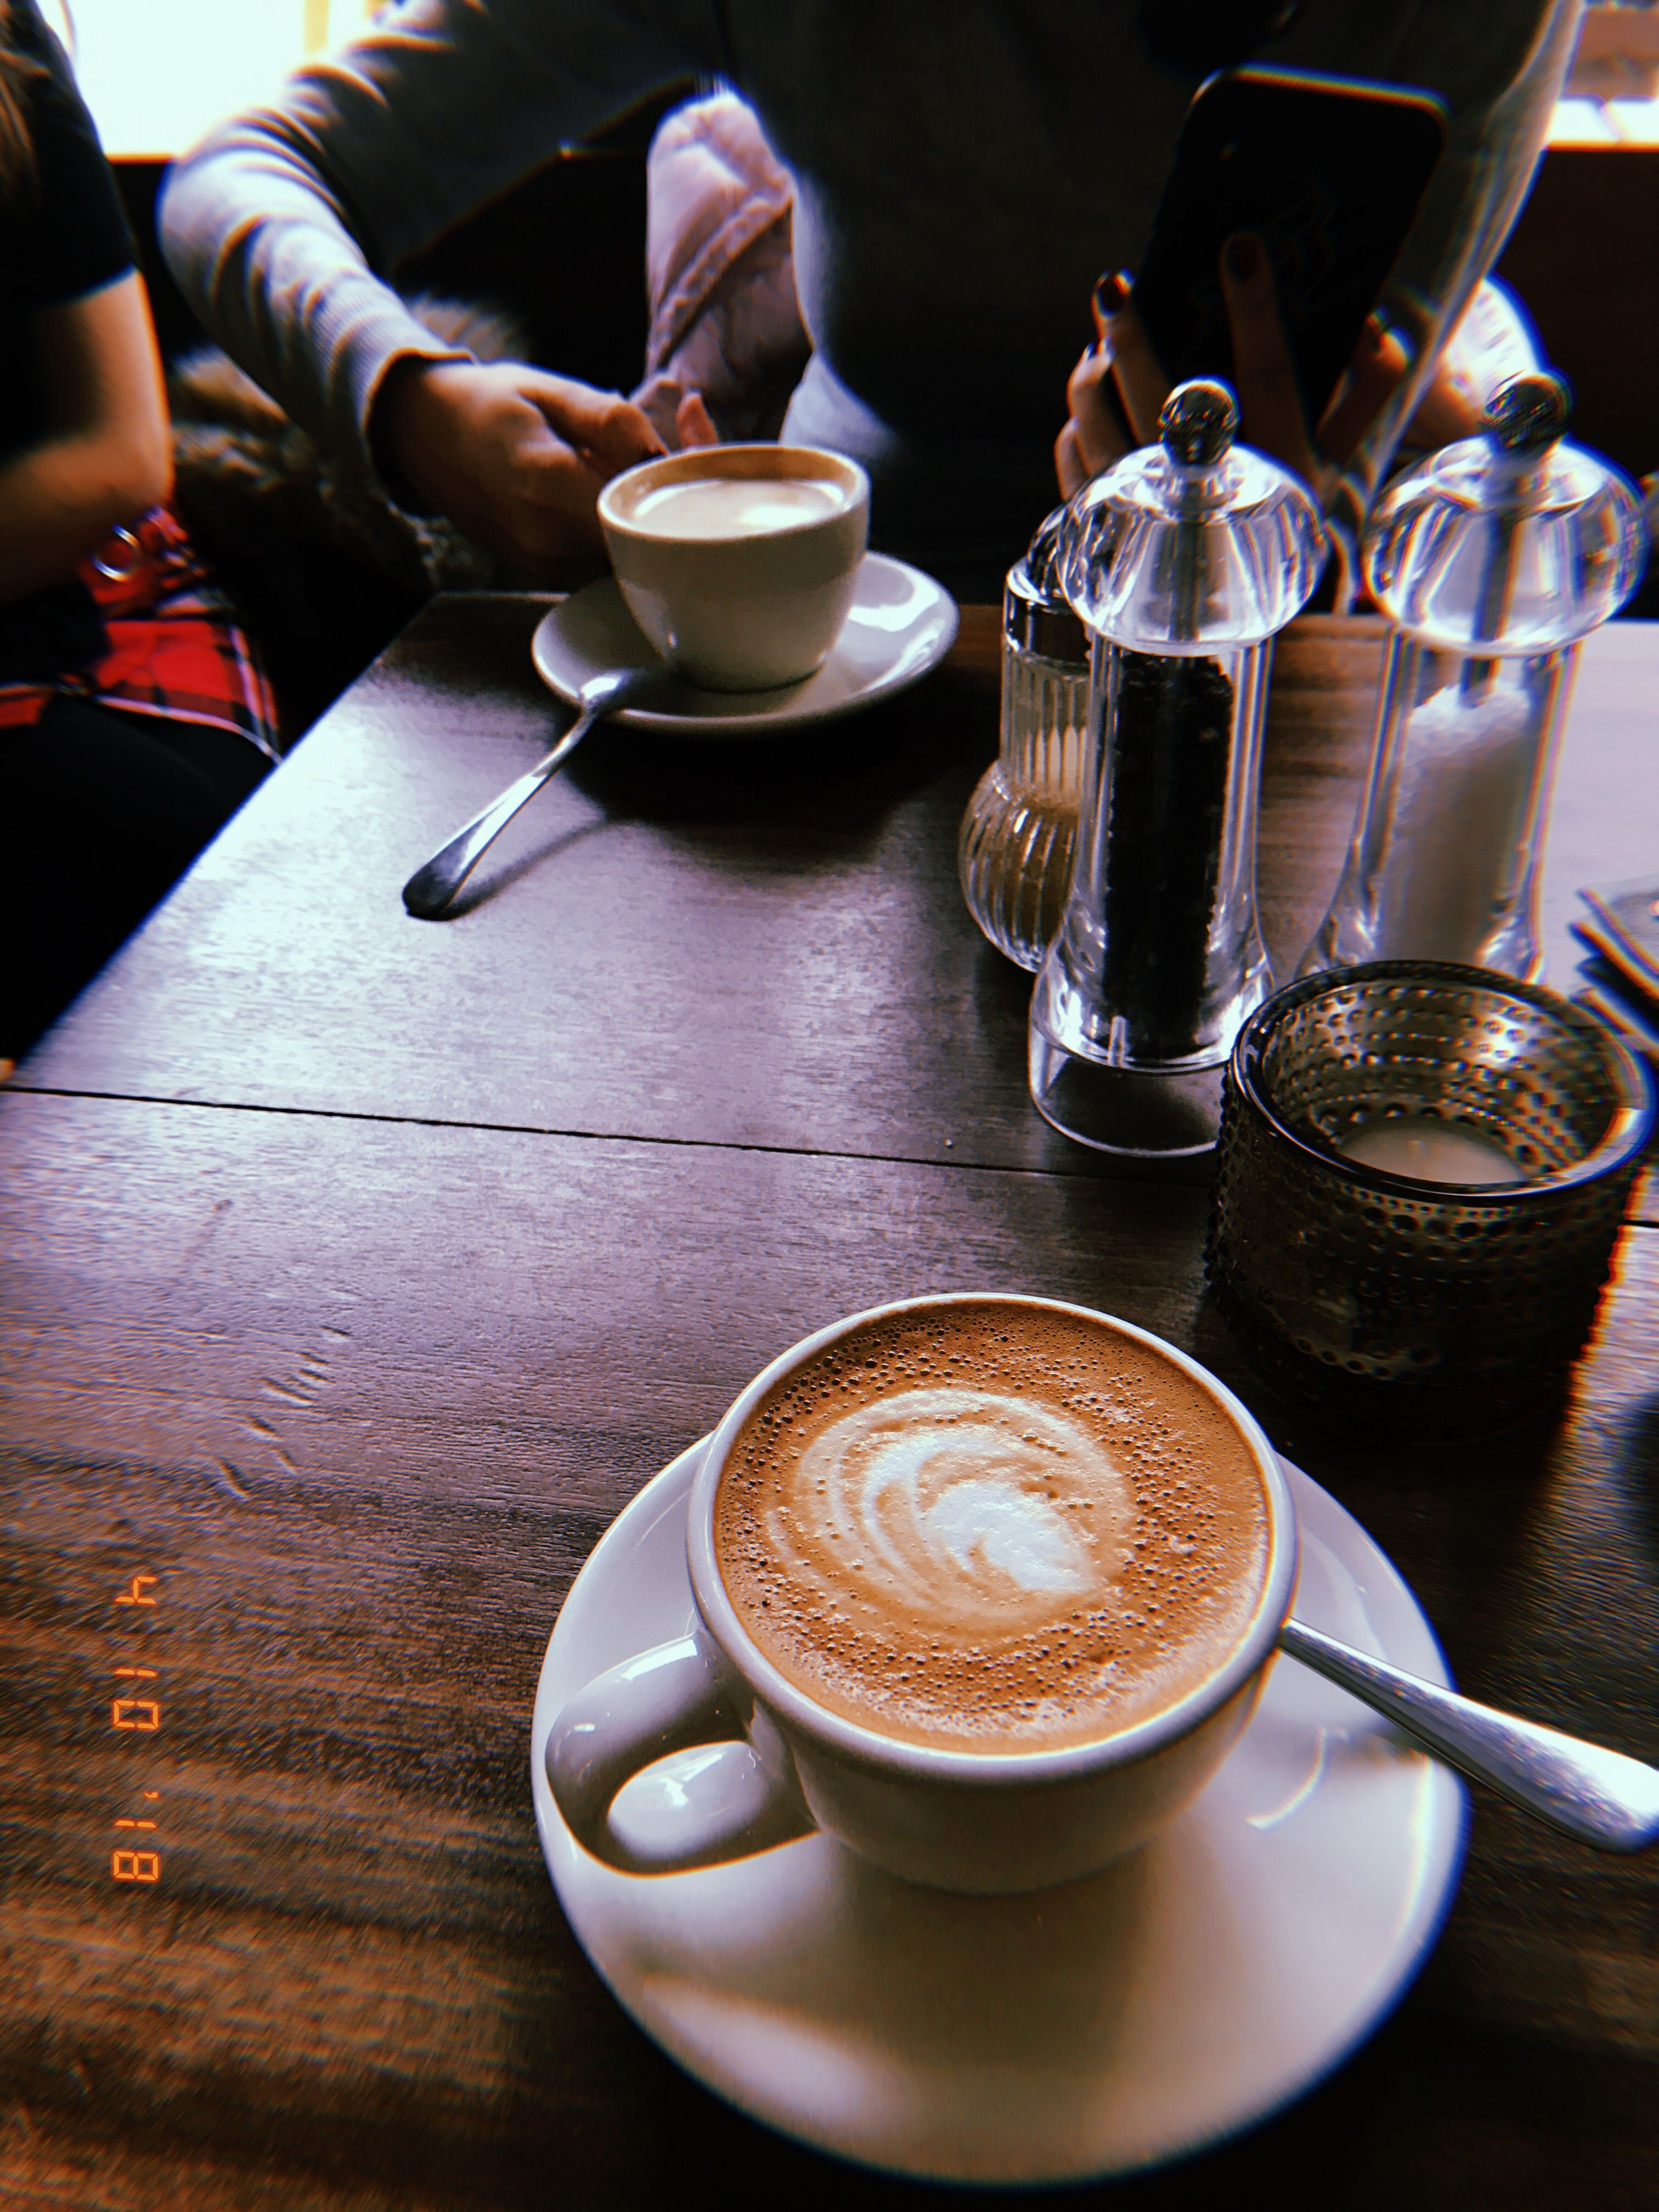 факт фото кофе ночью в кафе салоне